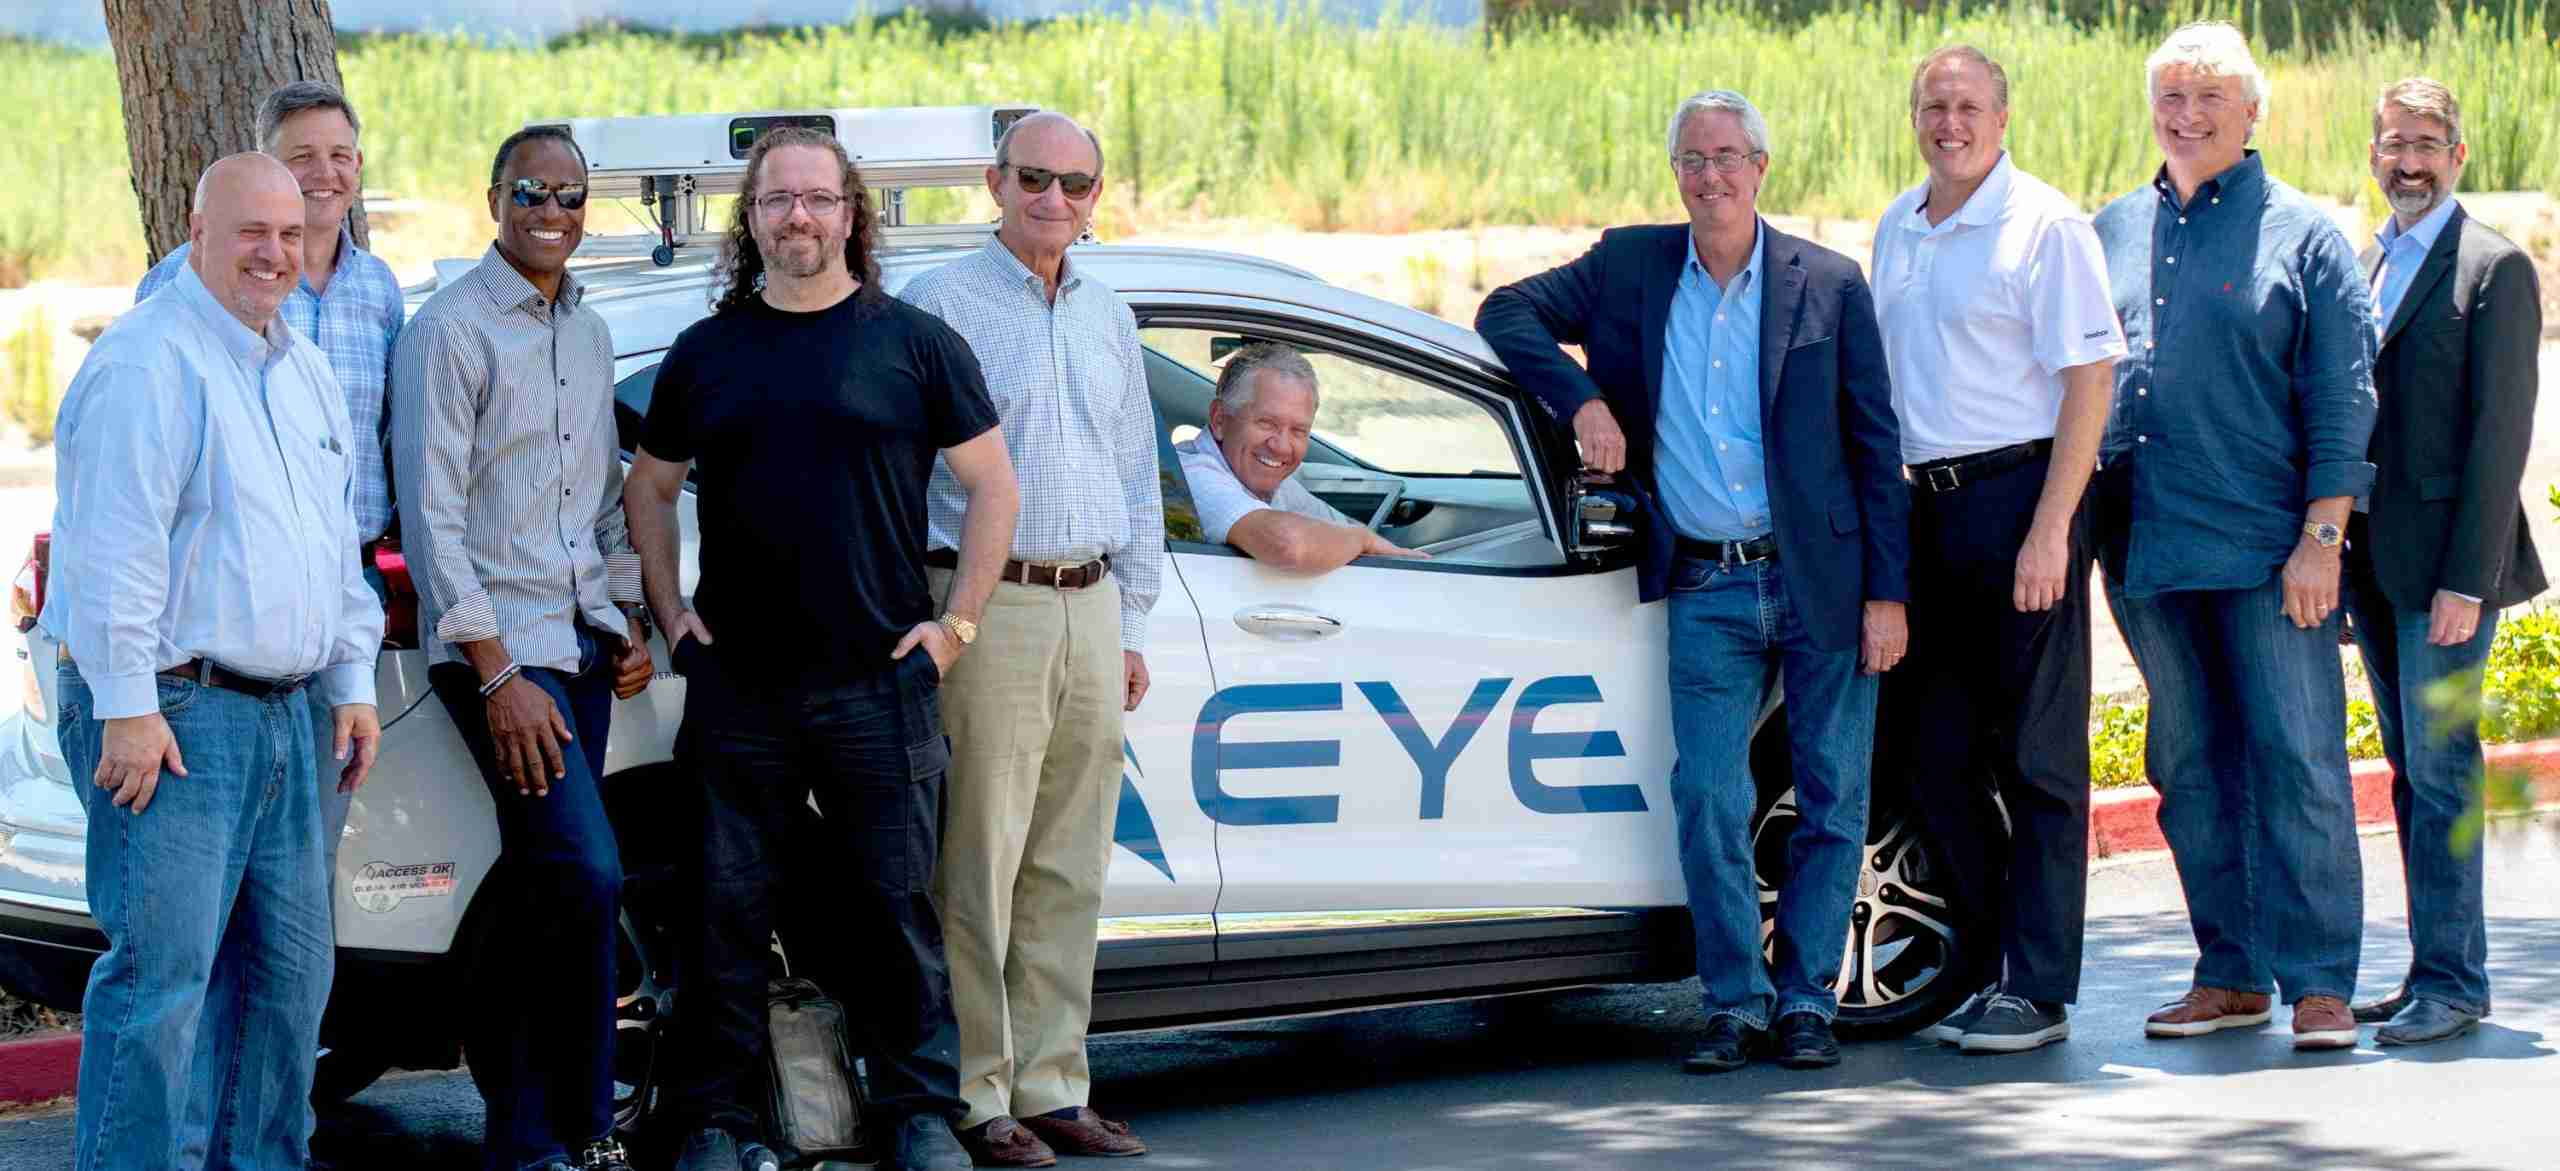 AEye Advisory Board posing in front of AEye's autonomous vehicle with AEye's iDAR smart sensor